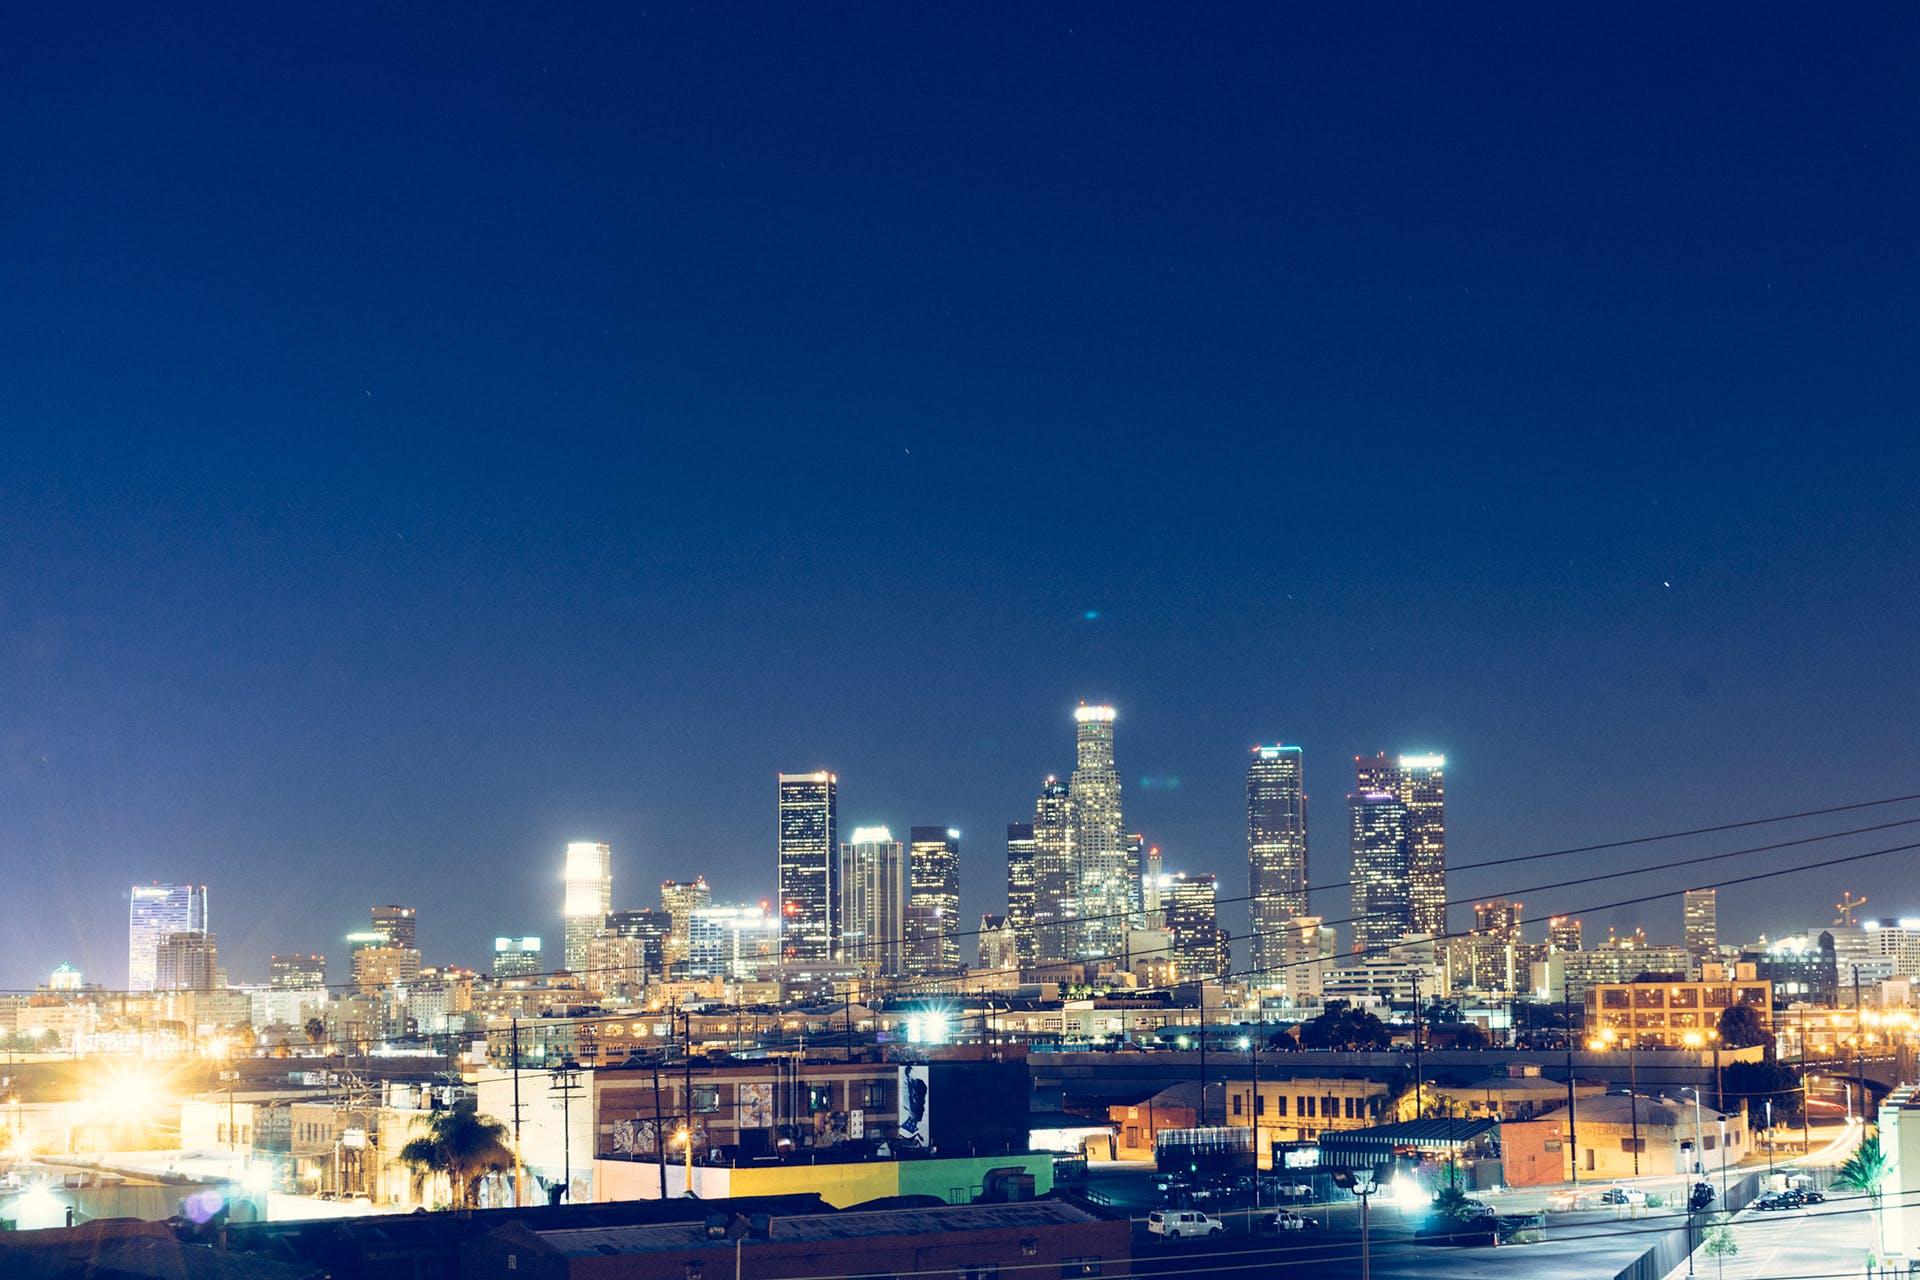 Free stock photo of city, night, skyline, HD wallpaper